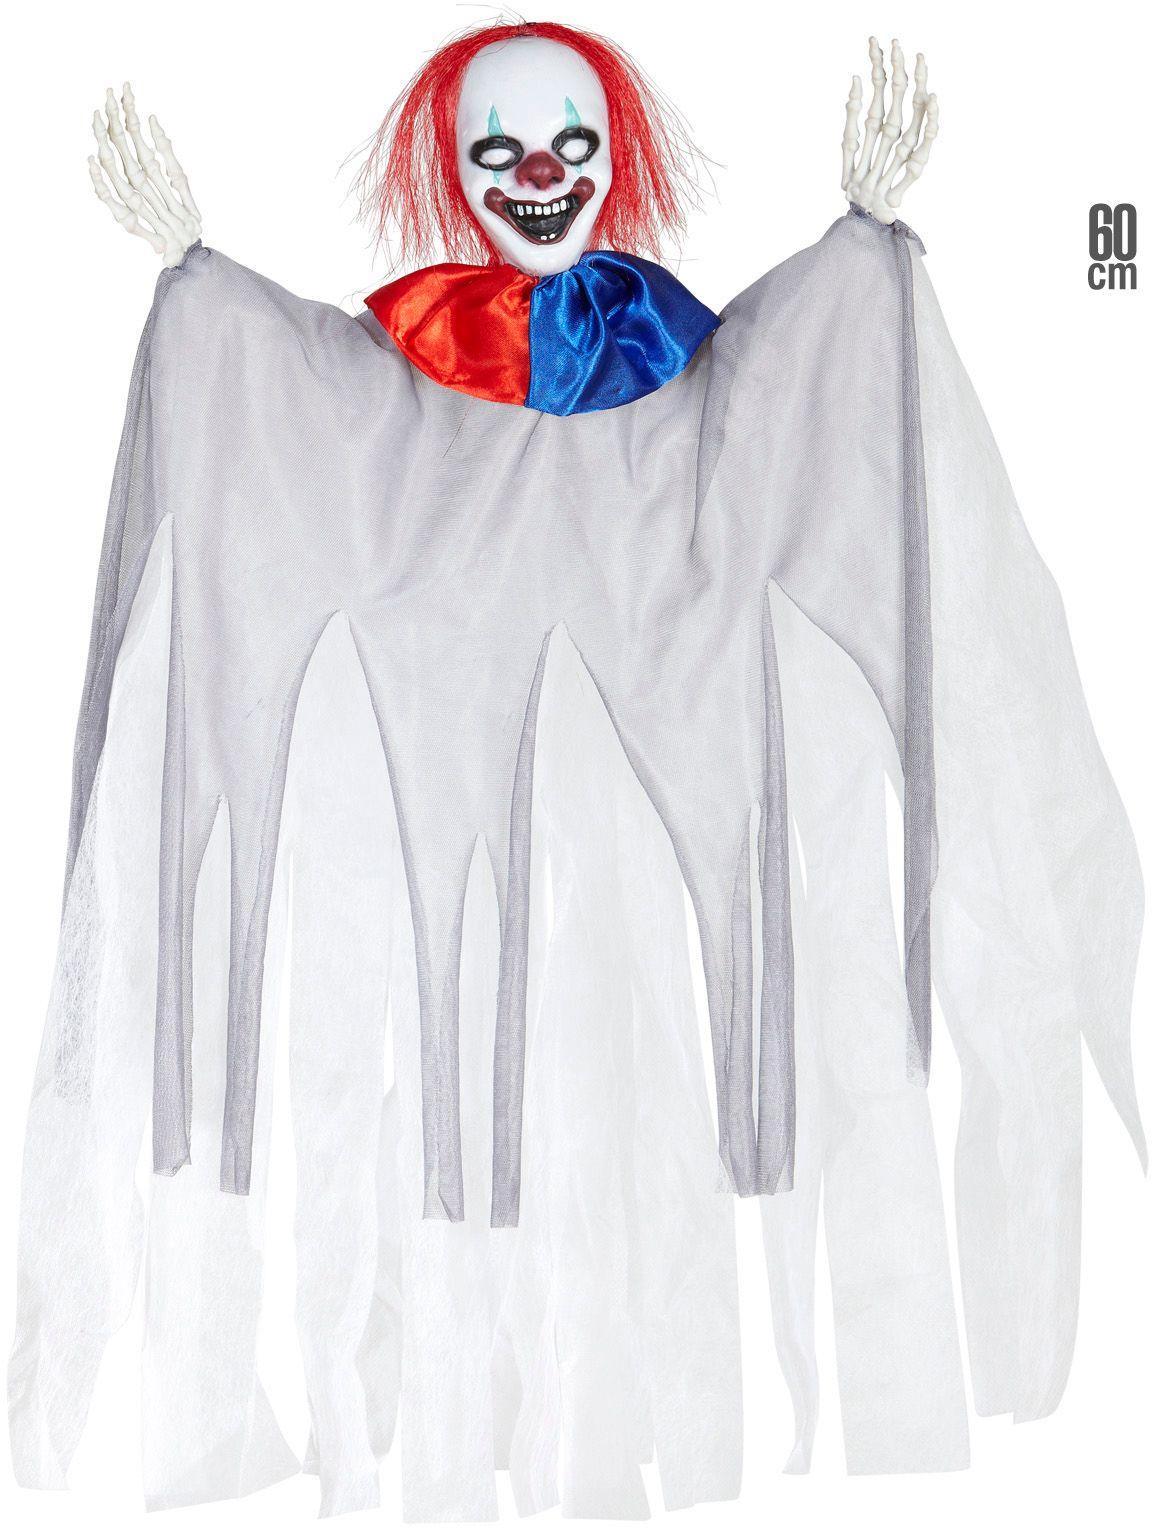 Killer clown versiering